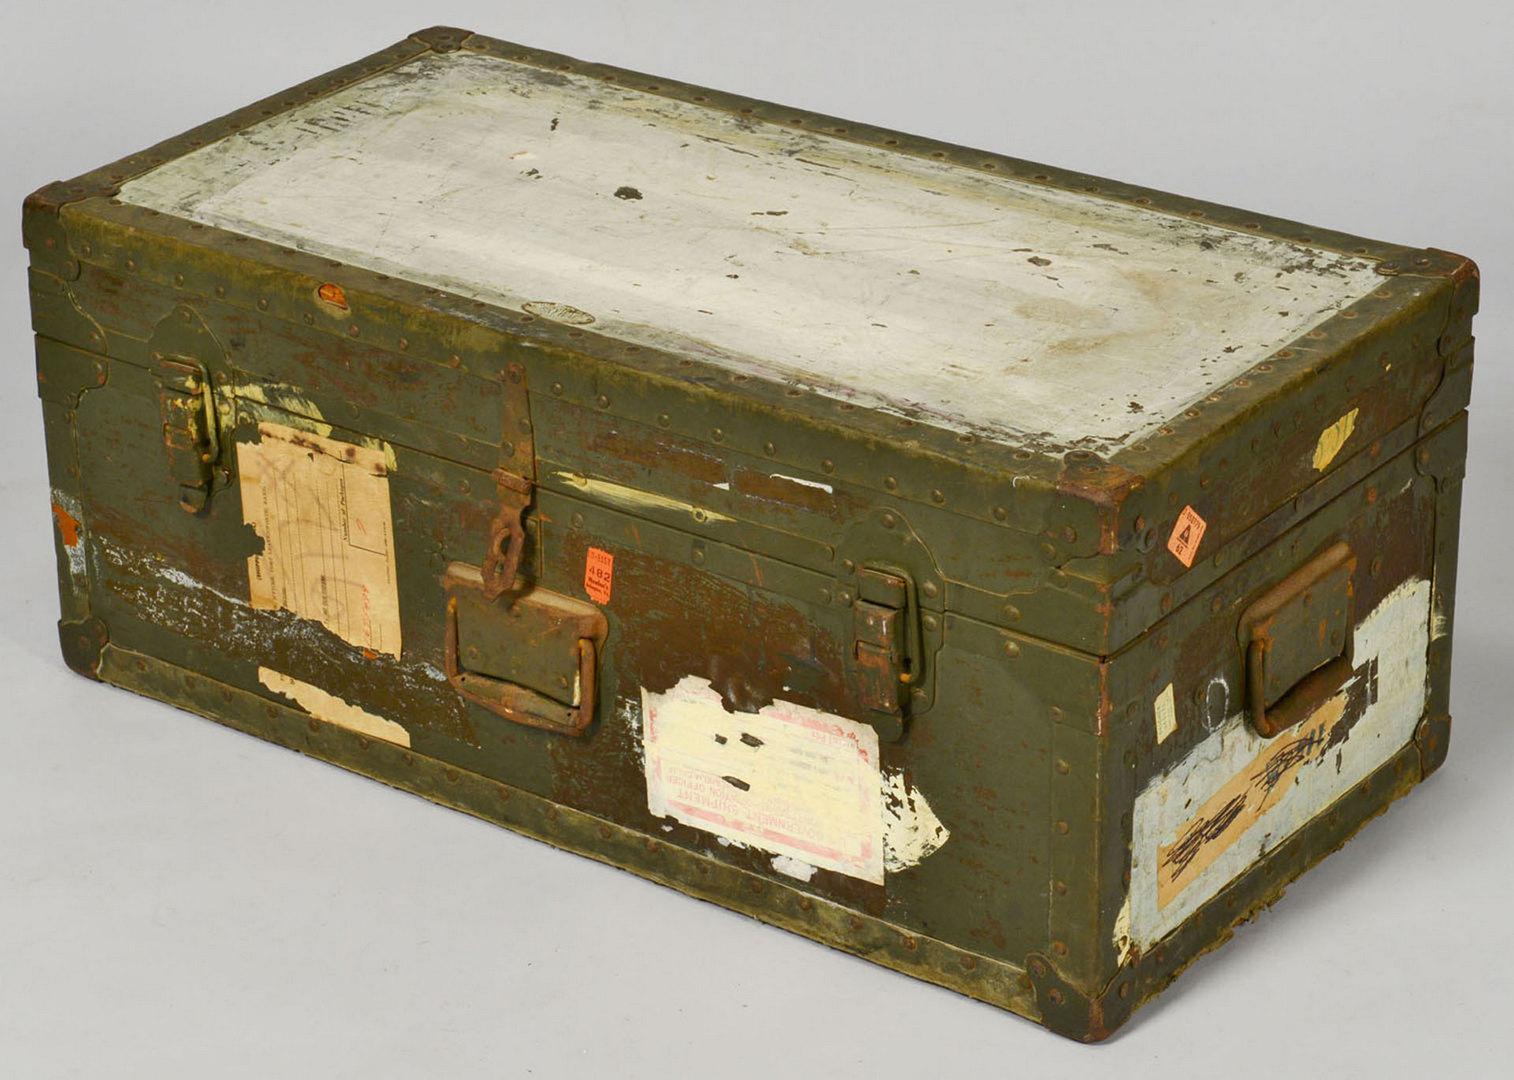 Lot 531: Military Items: Field Desk, Foot Locker, Shells